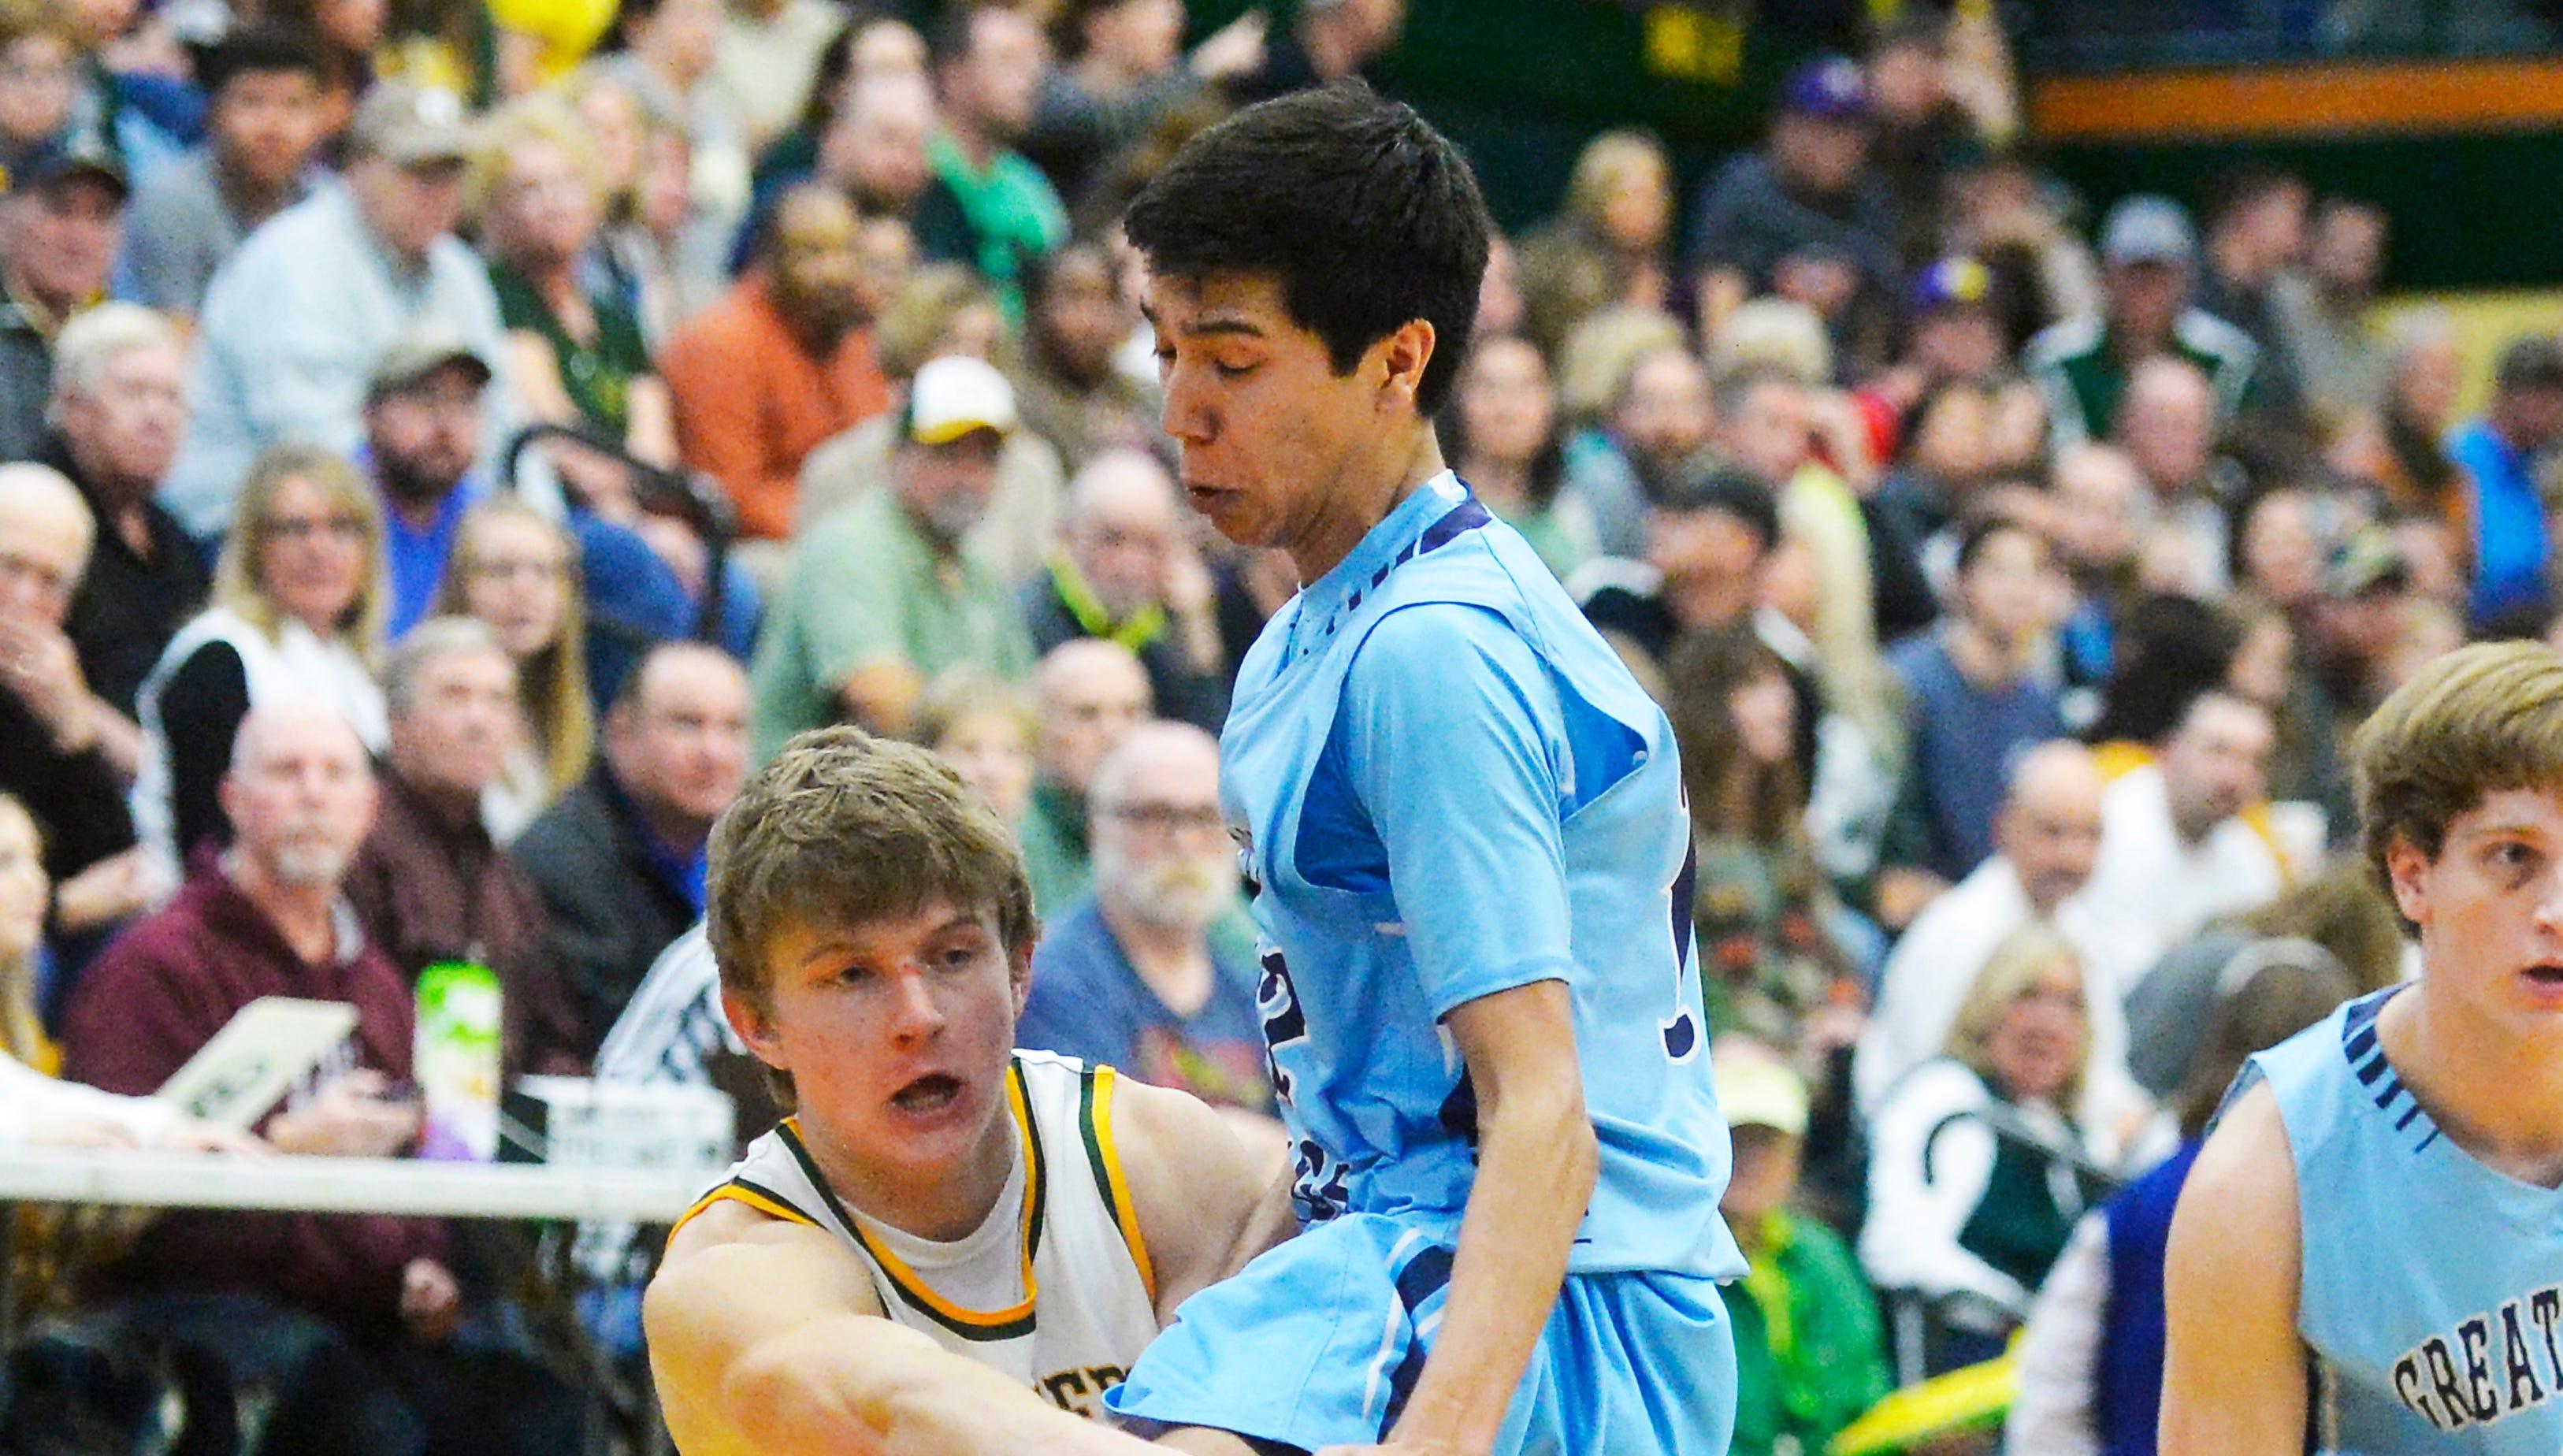 Great Falls High, CMR boys' basketball teams home this weekend to take on Bozeman, Billings Senior